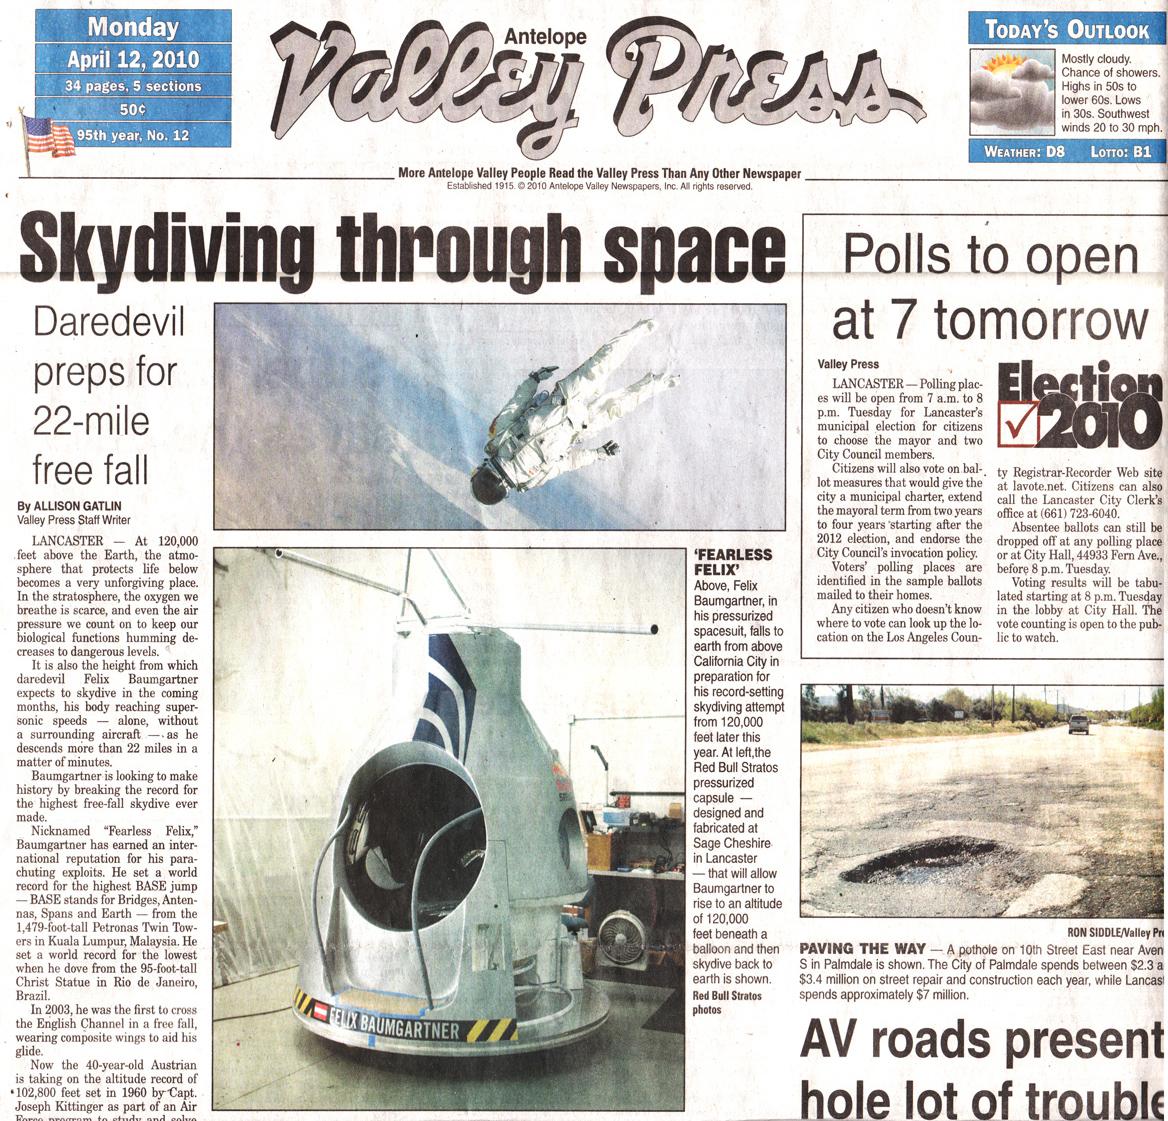 Designall20 July 2012: Antelope Valley Press